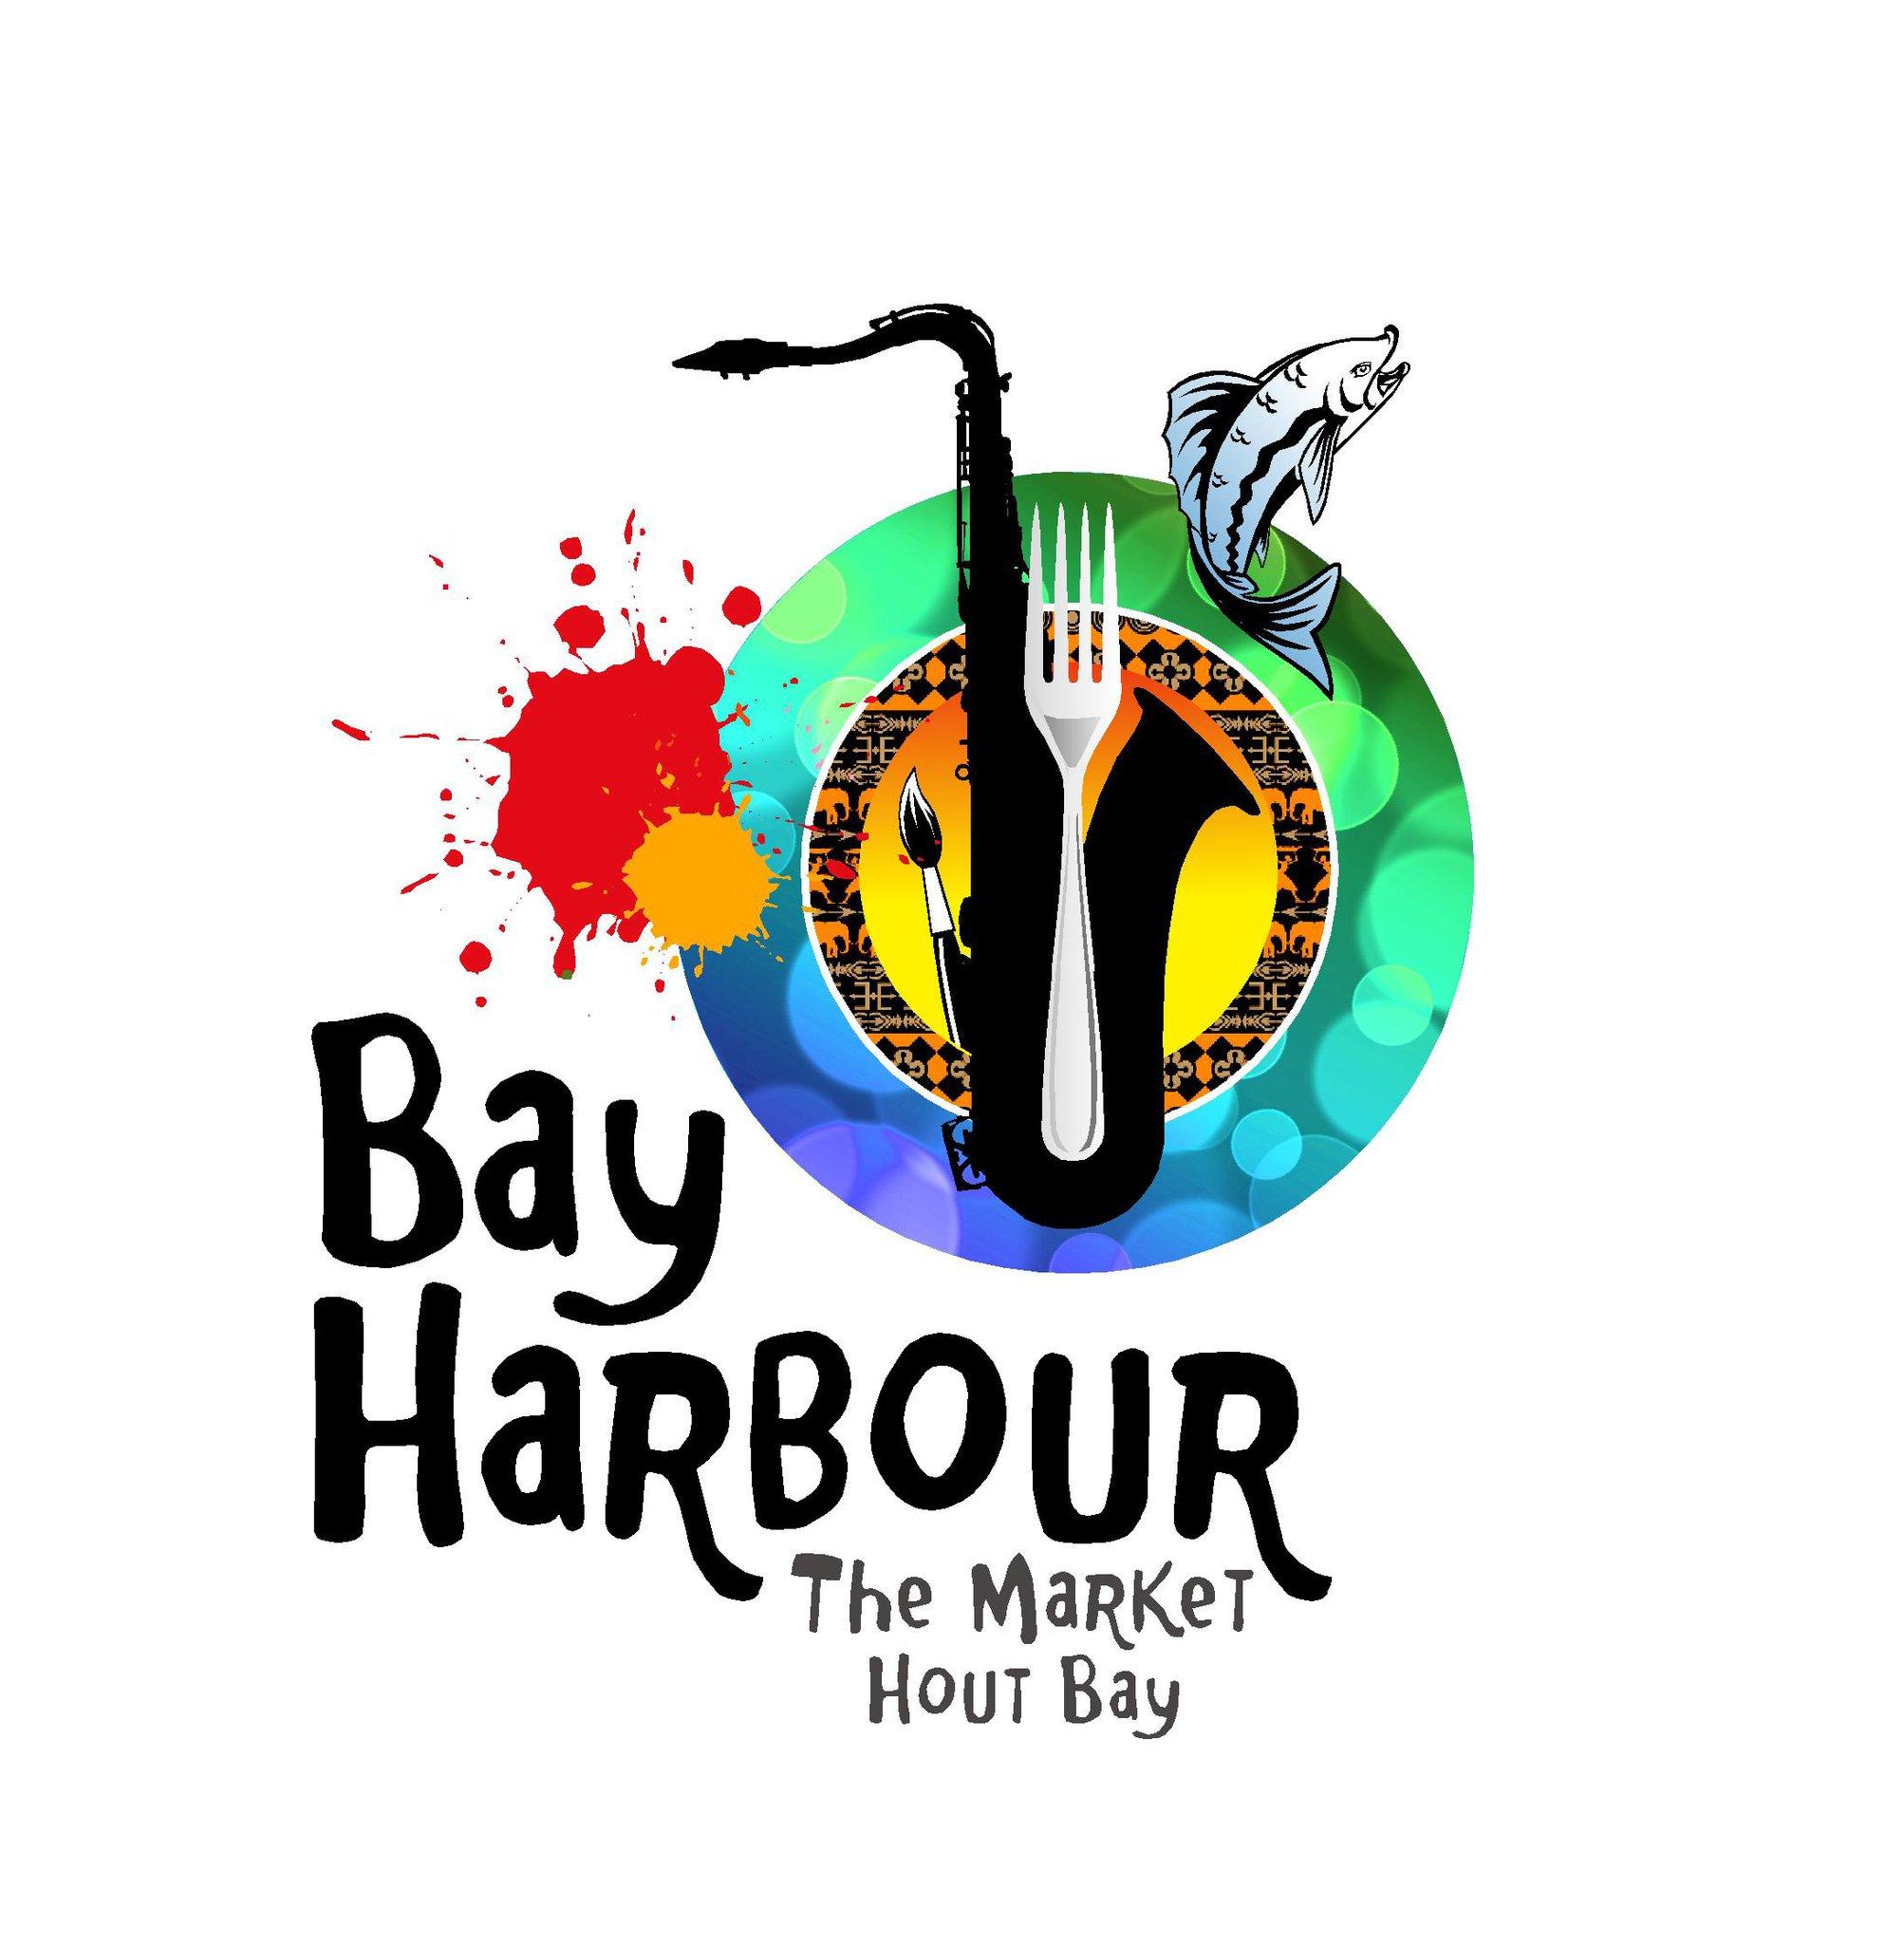 Bay Harbour Market in Hout Bay.